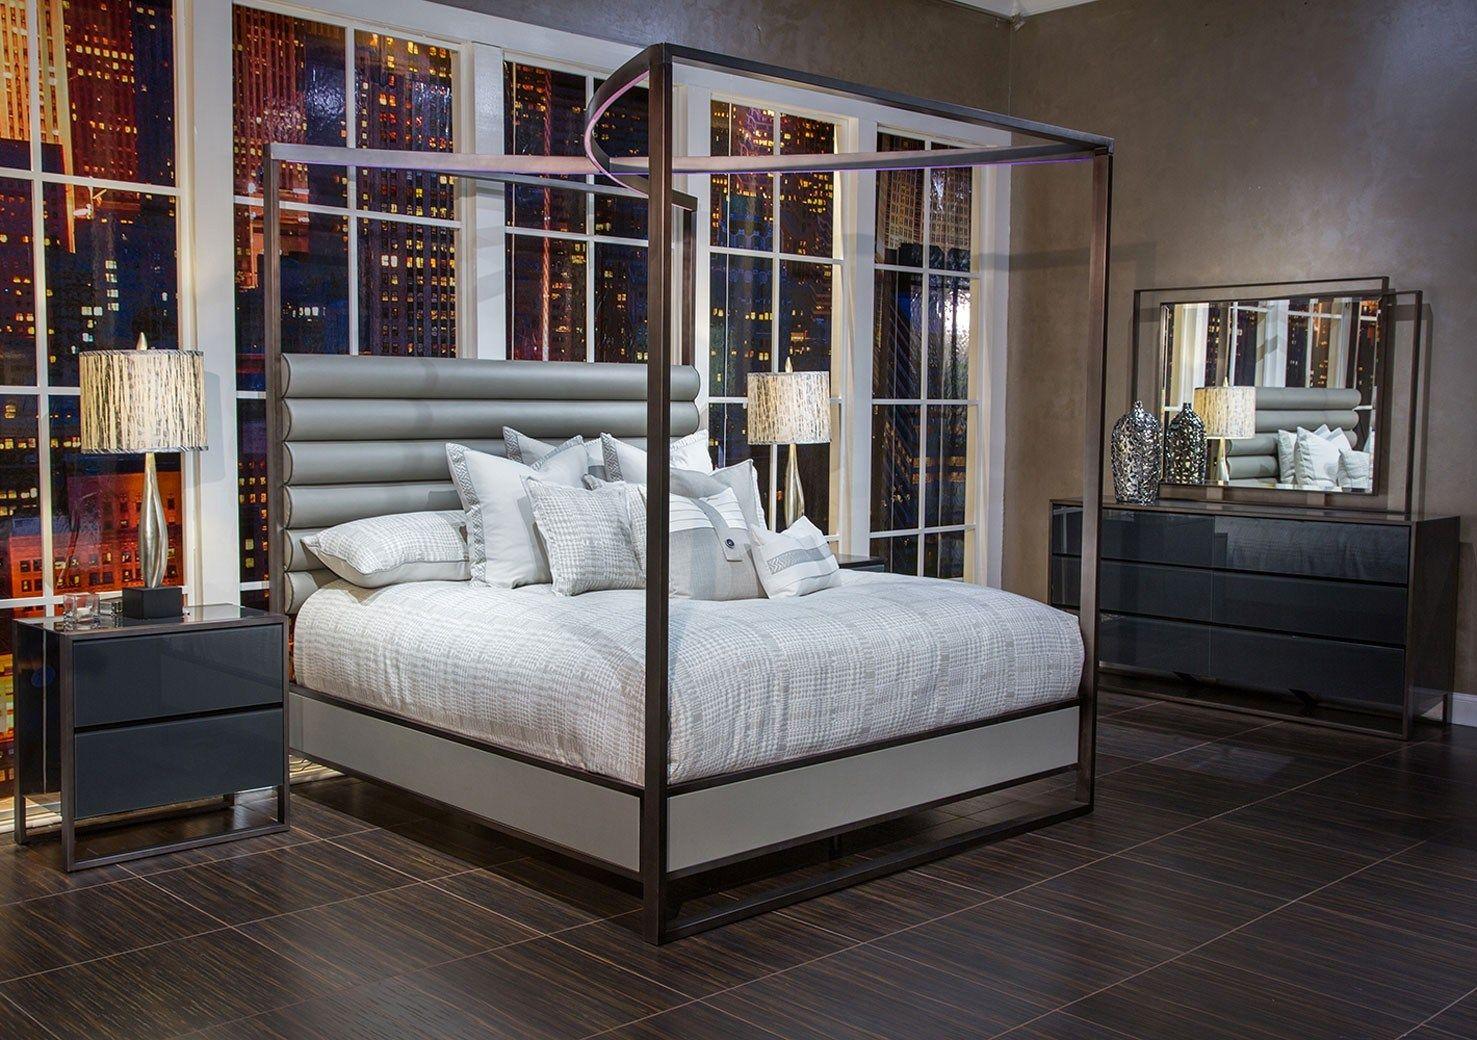 bunk_bed_designs raised_garden_bed_designs bed_design